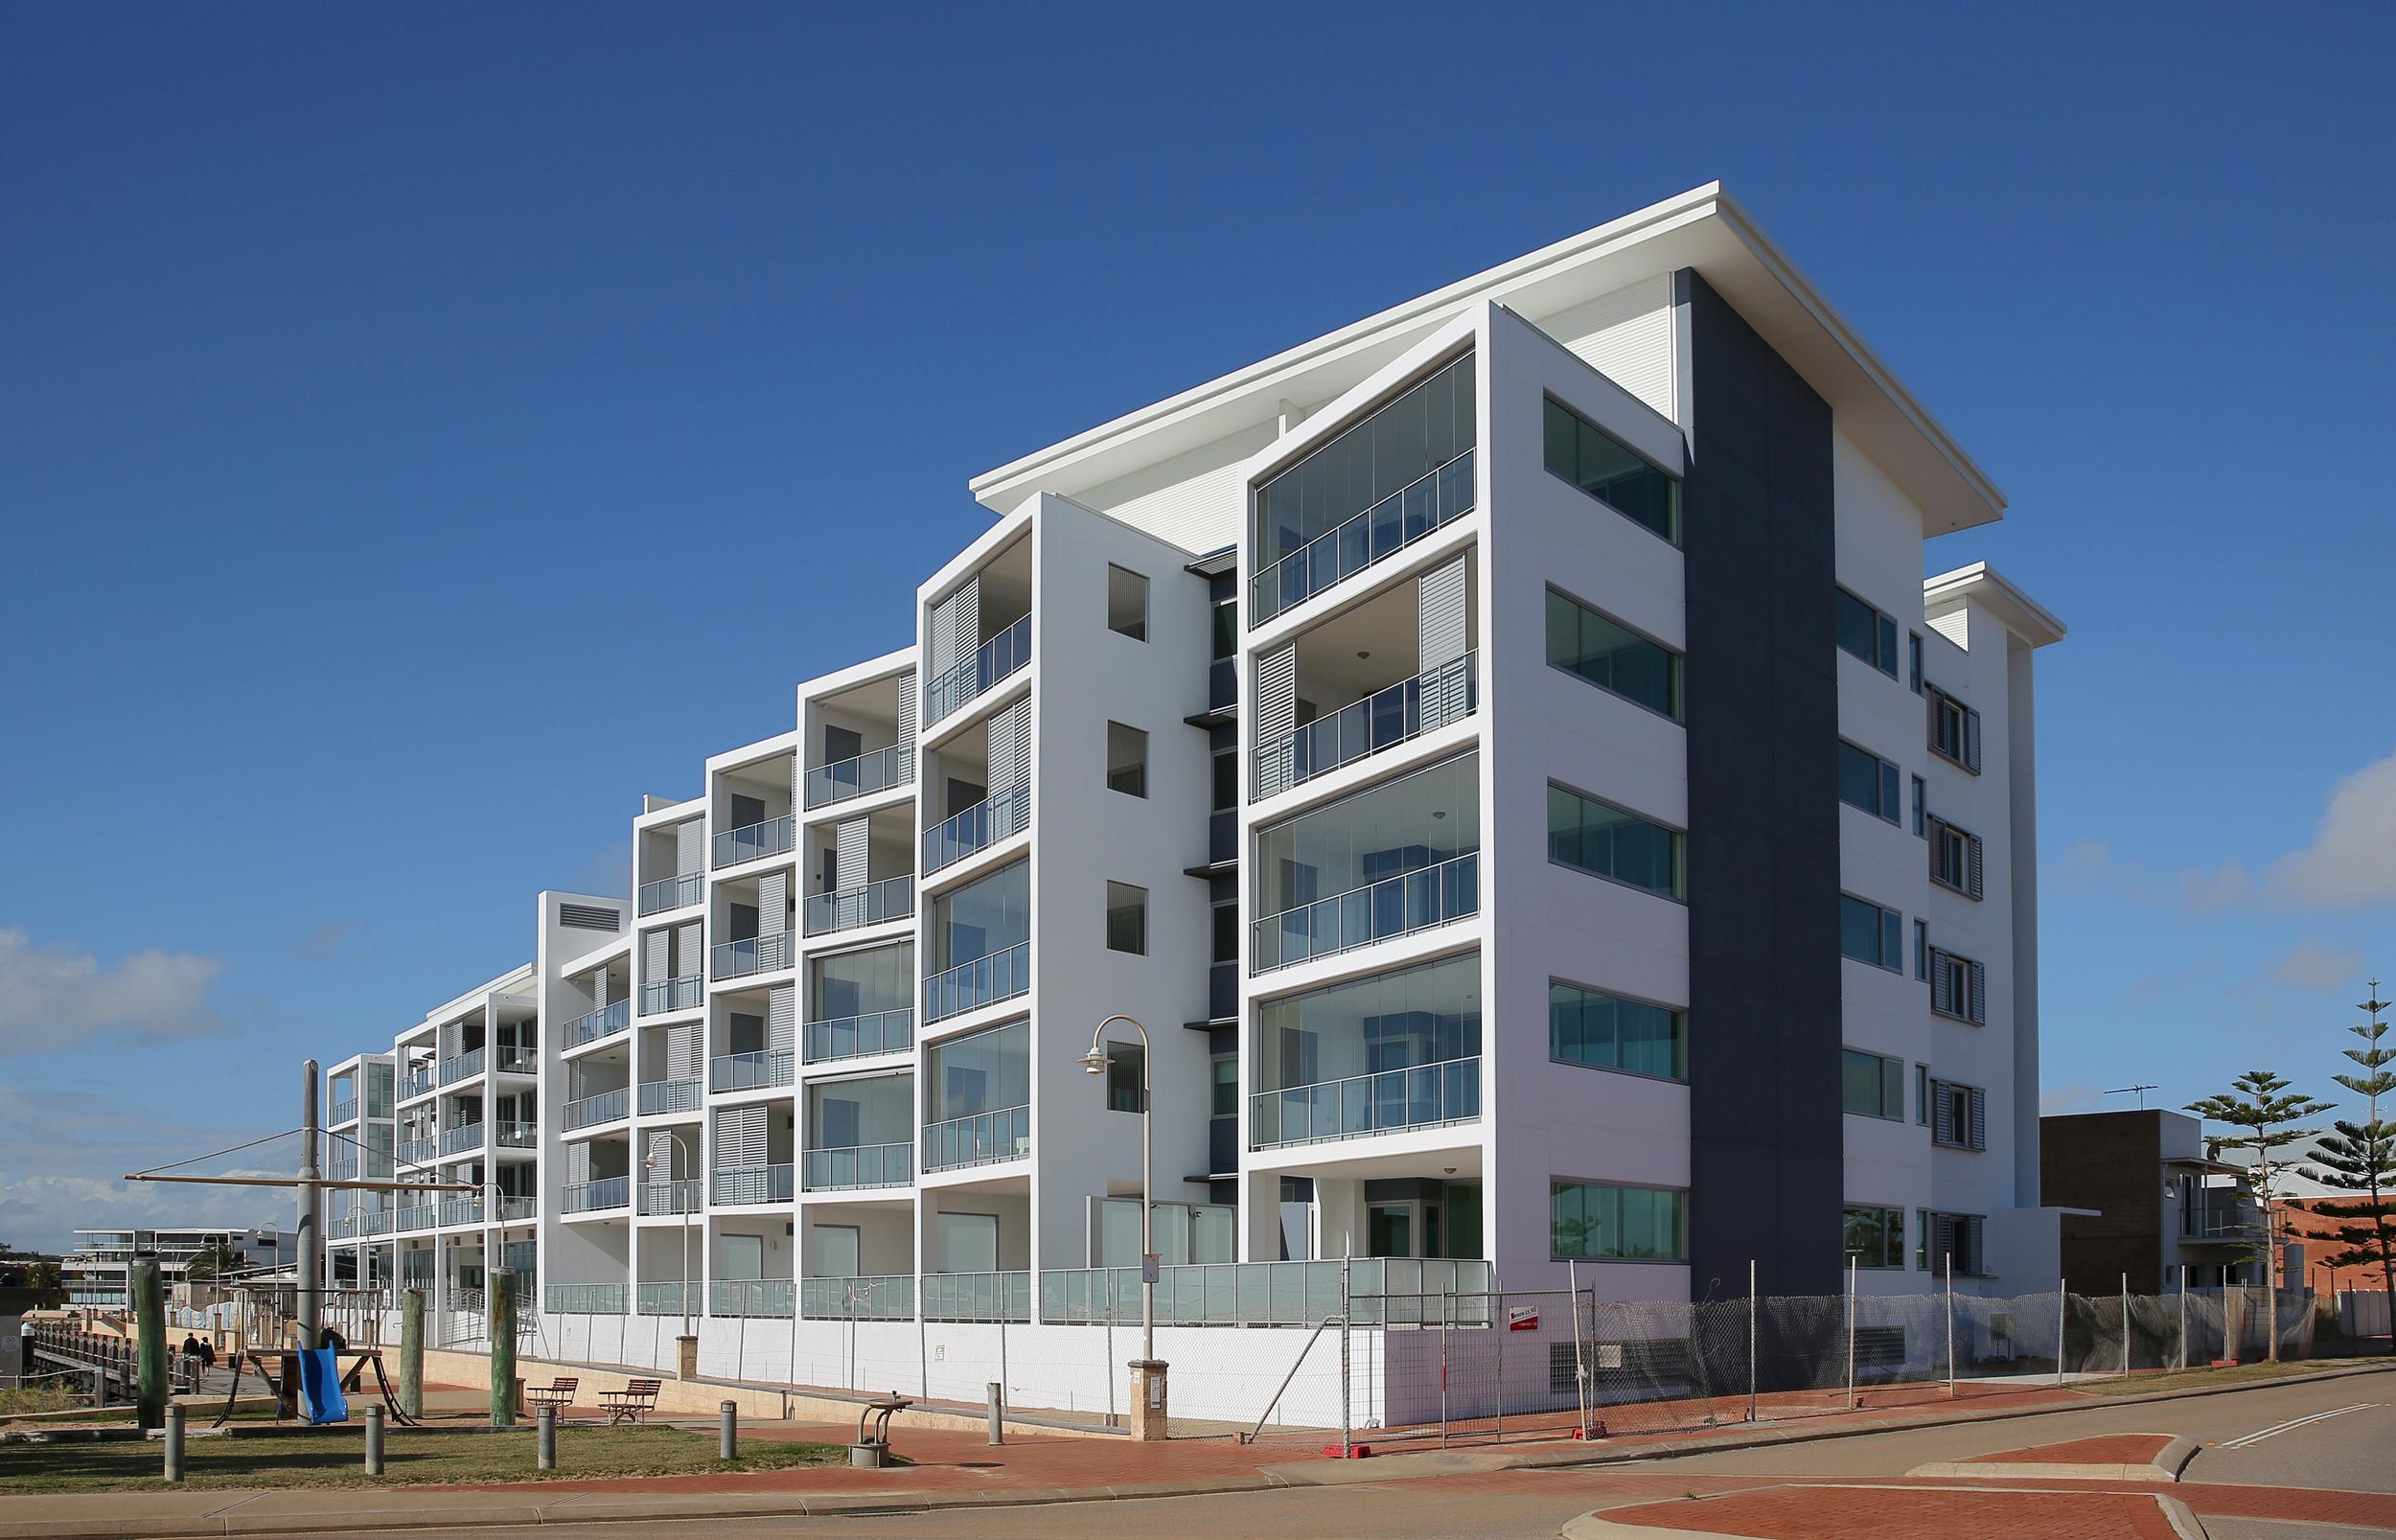 CROTHERS CONSTRUCTION - BATAVIA COAST APARTMENTS